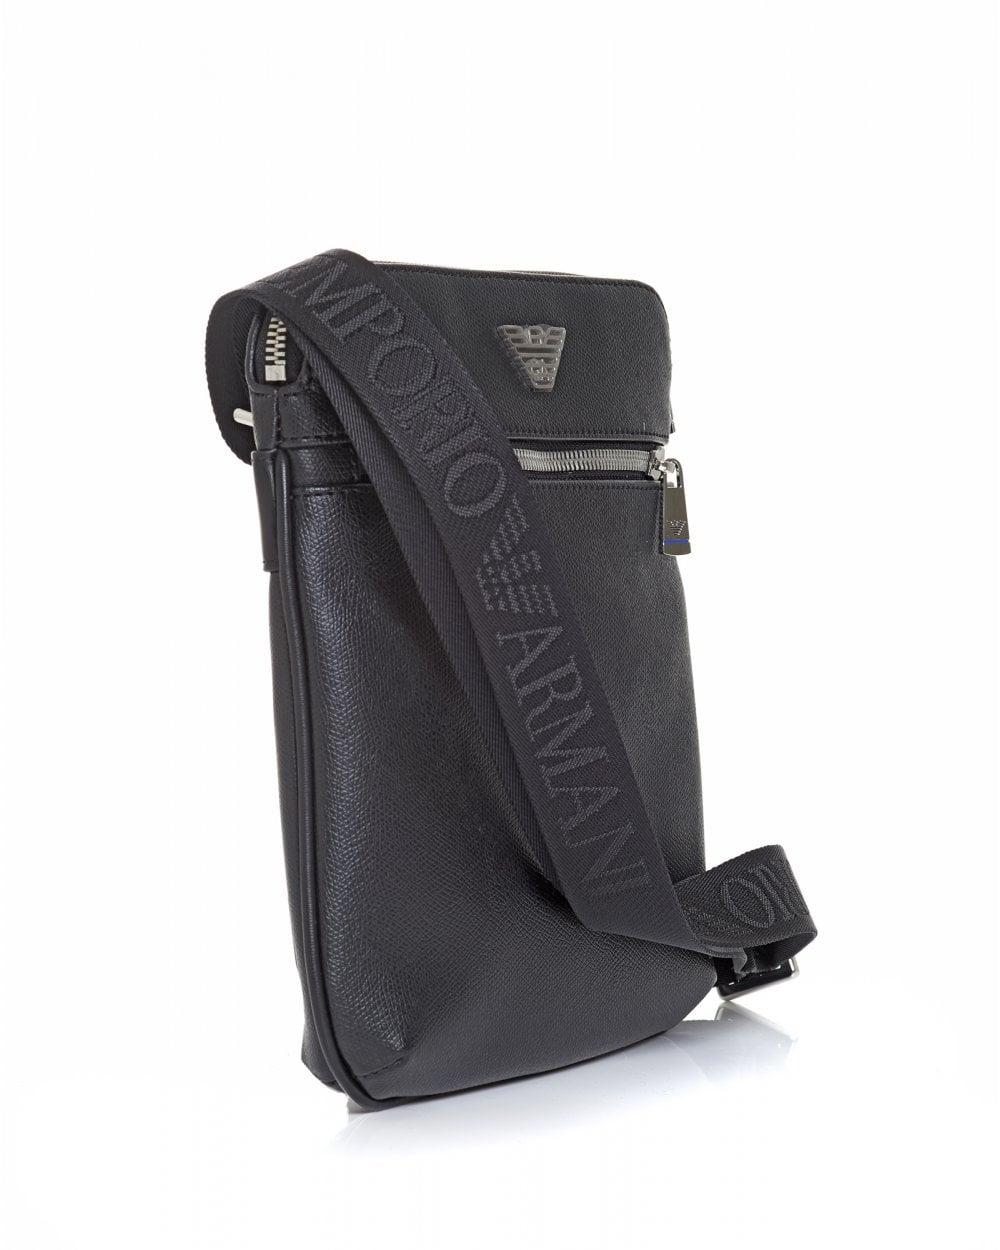 532193cd7d Emporio Armani Mens Silver Eagle Logo Black Crossbody Stash Bag